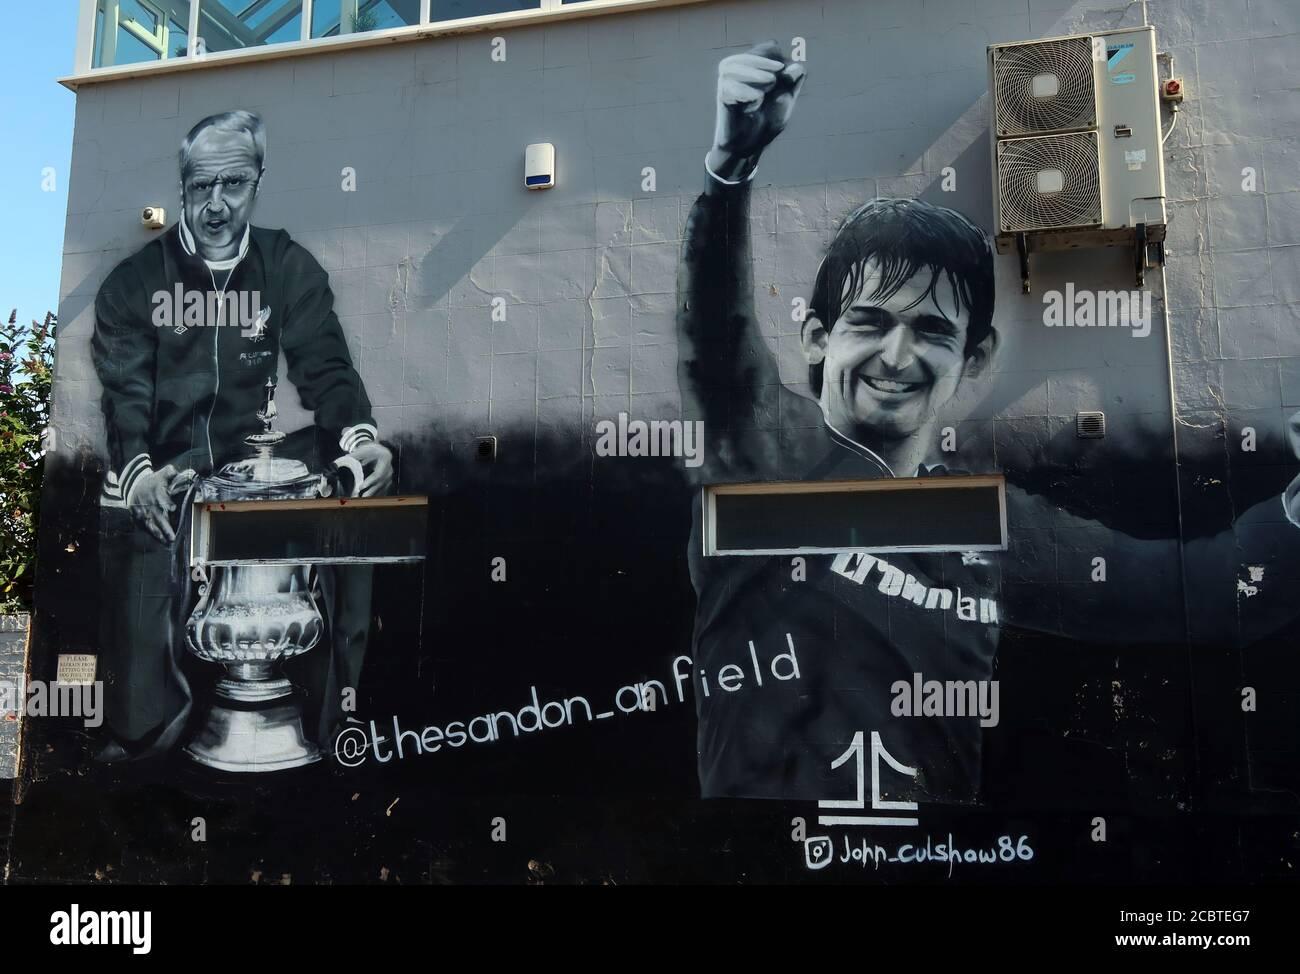 Dieses Stockfoto: Das Sandon Wandbild, LFC, Liverpool Football Club, Anfield, Premier League, Merseyside, Nordwestengland, Großbritannien, L4 2UZ - 2CBTEG